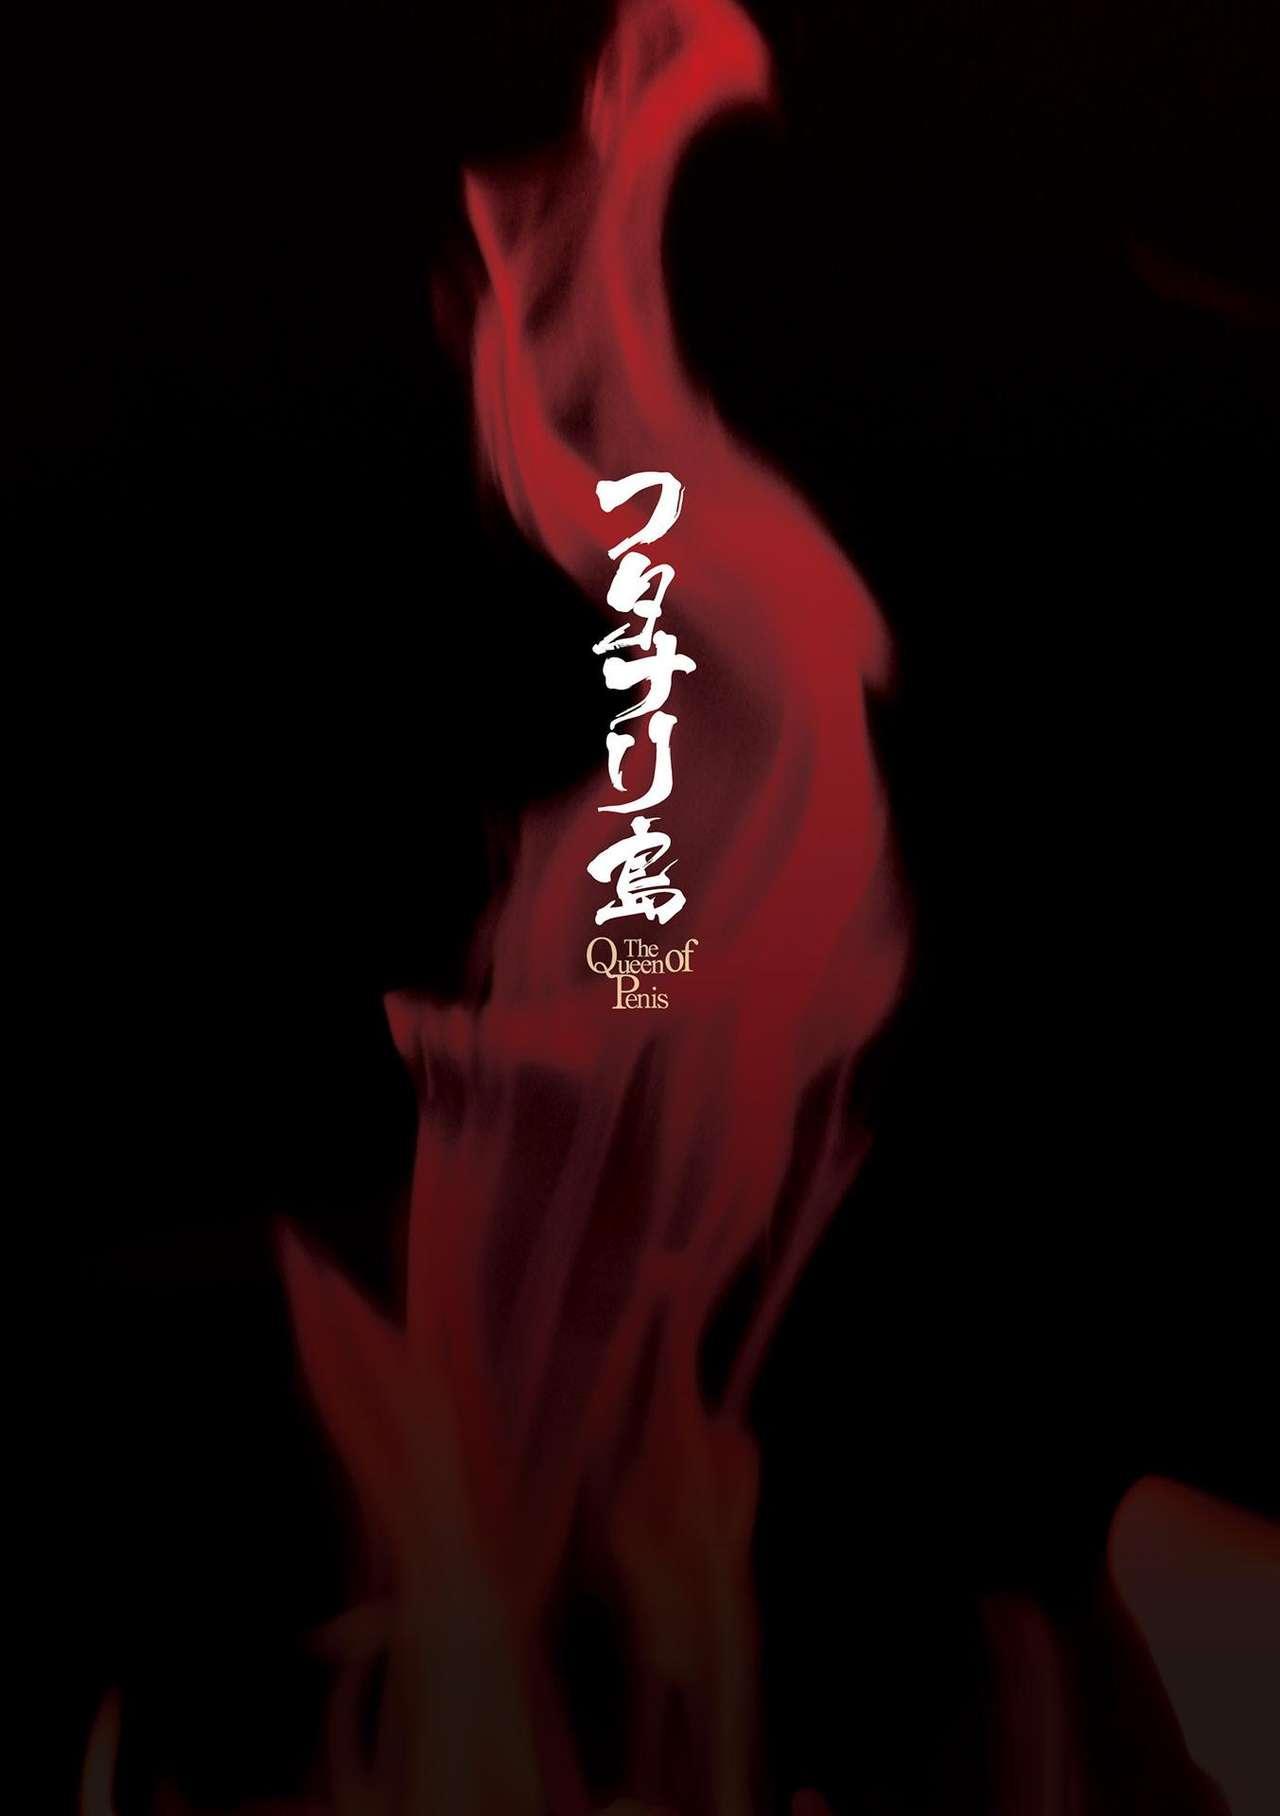 [Kaguya] Futanarijima ~The Queen of Penis~Ch. 1 [Chinese] [鬼迷日眼的莱科少校个人川话化] 2